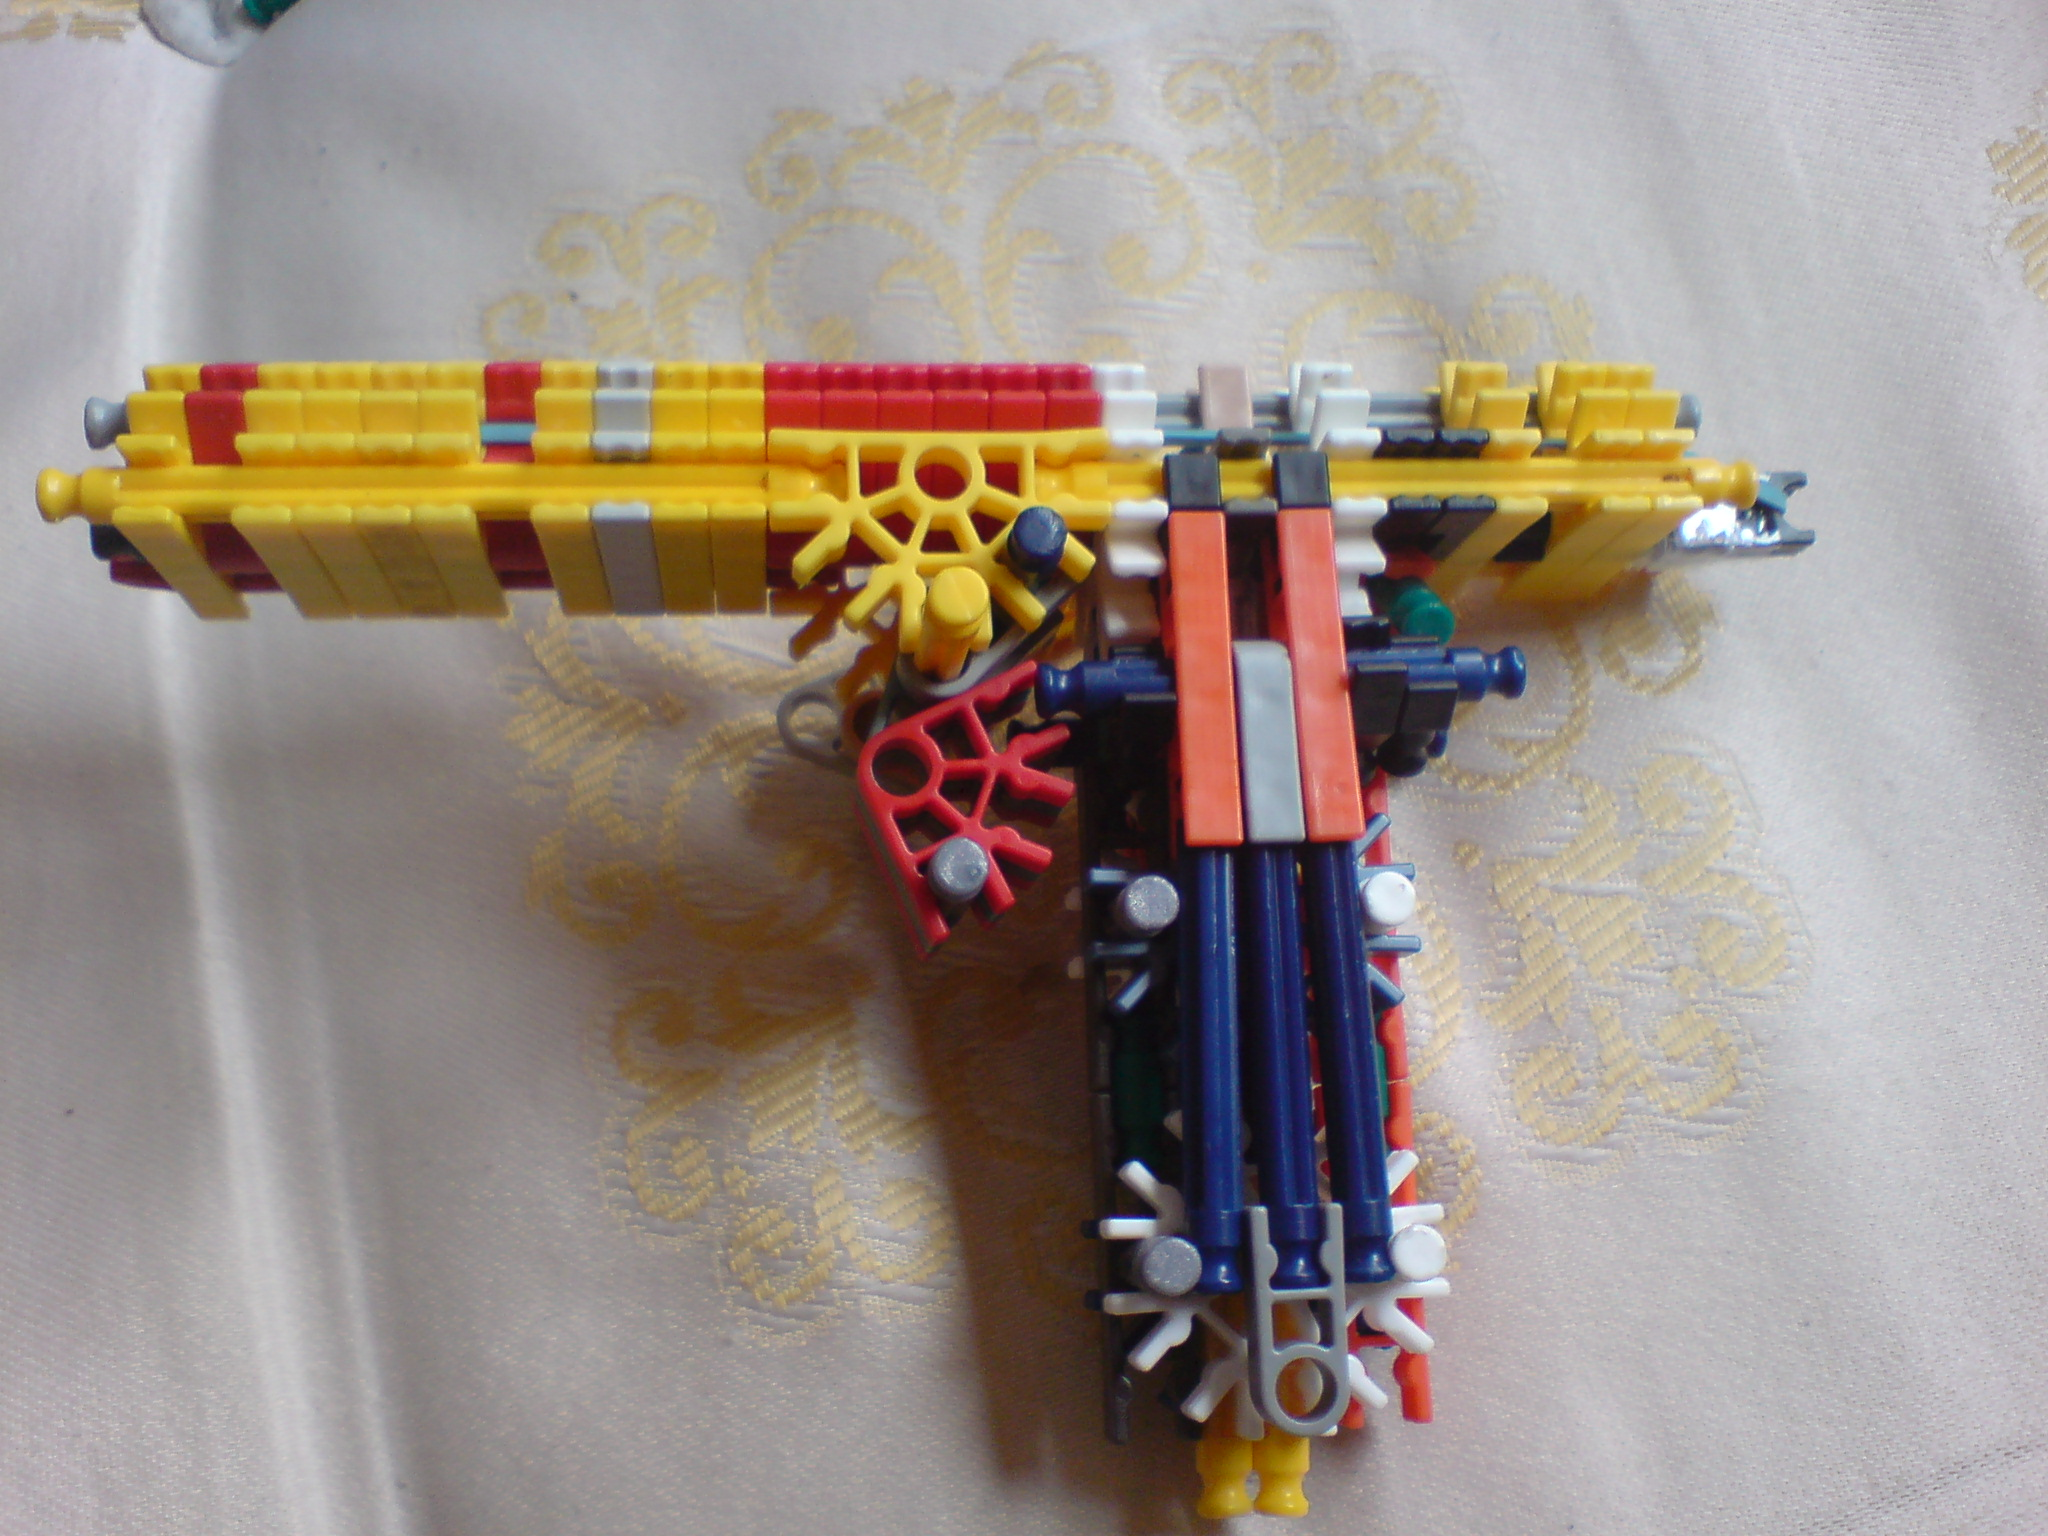 The Desert_Eagle Knex Gun-True trgger, detatchable clip , sturdy, good range